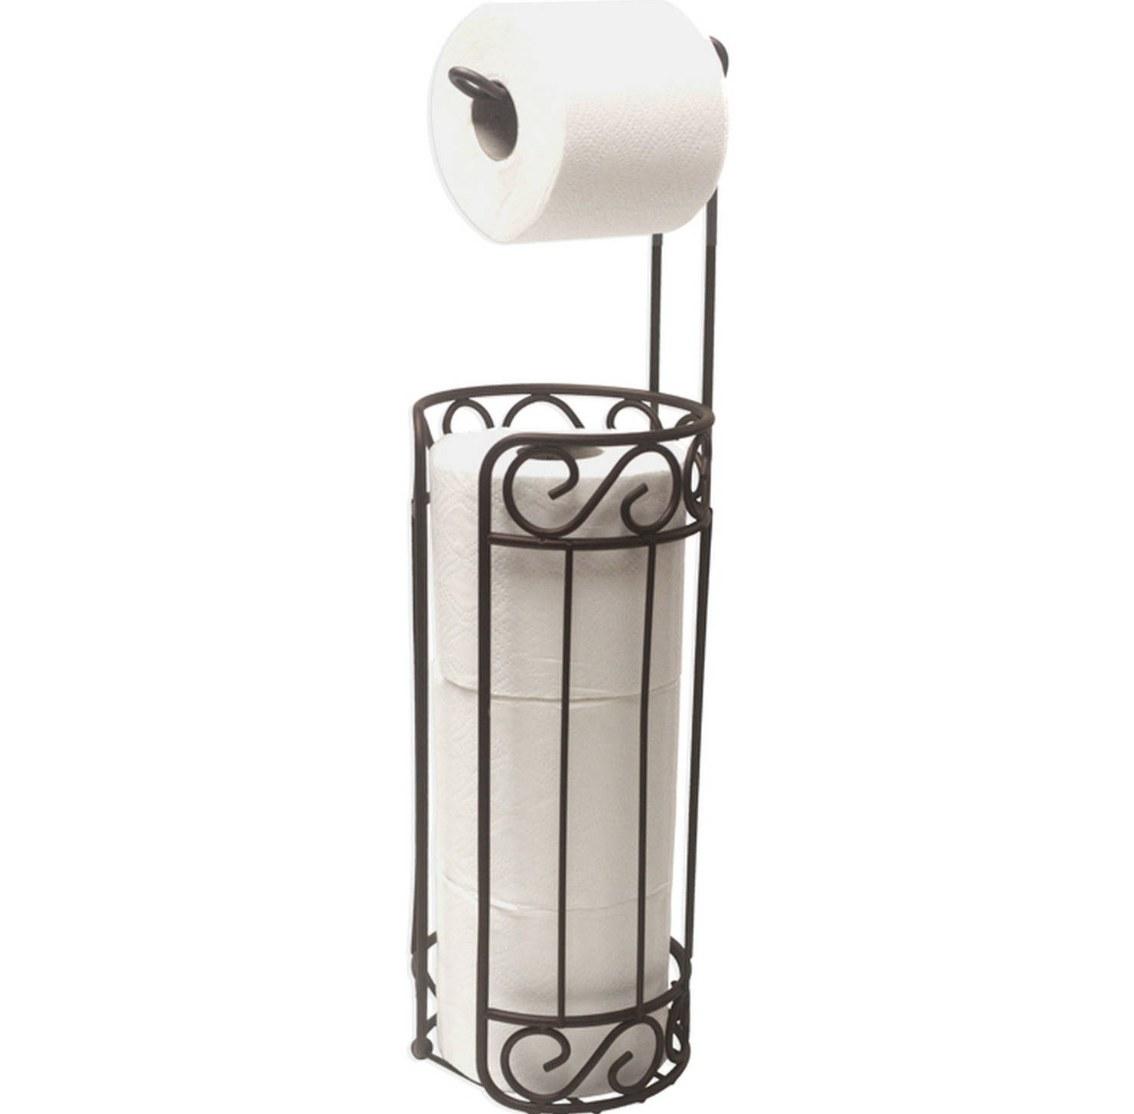 The bronze toilet paper holder and dispenser